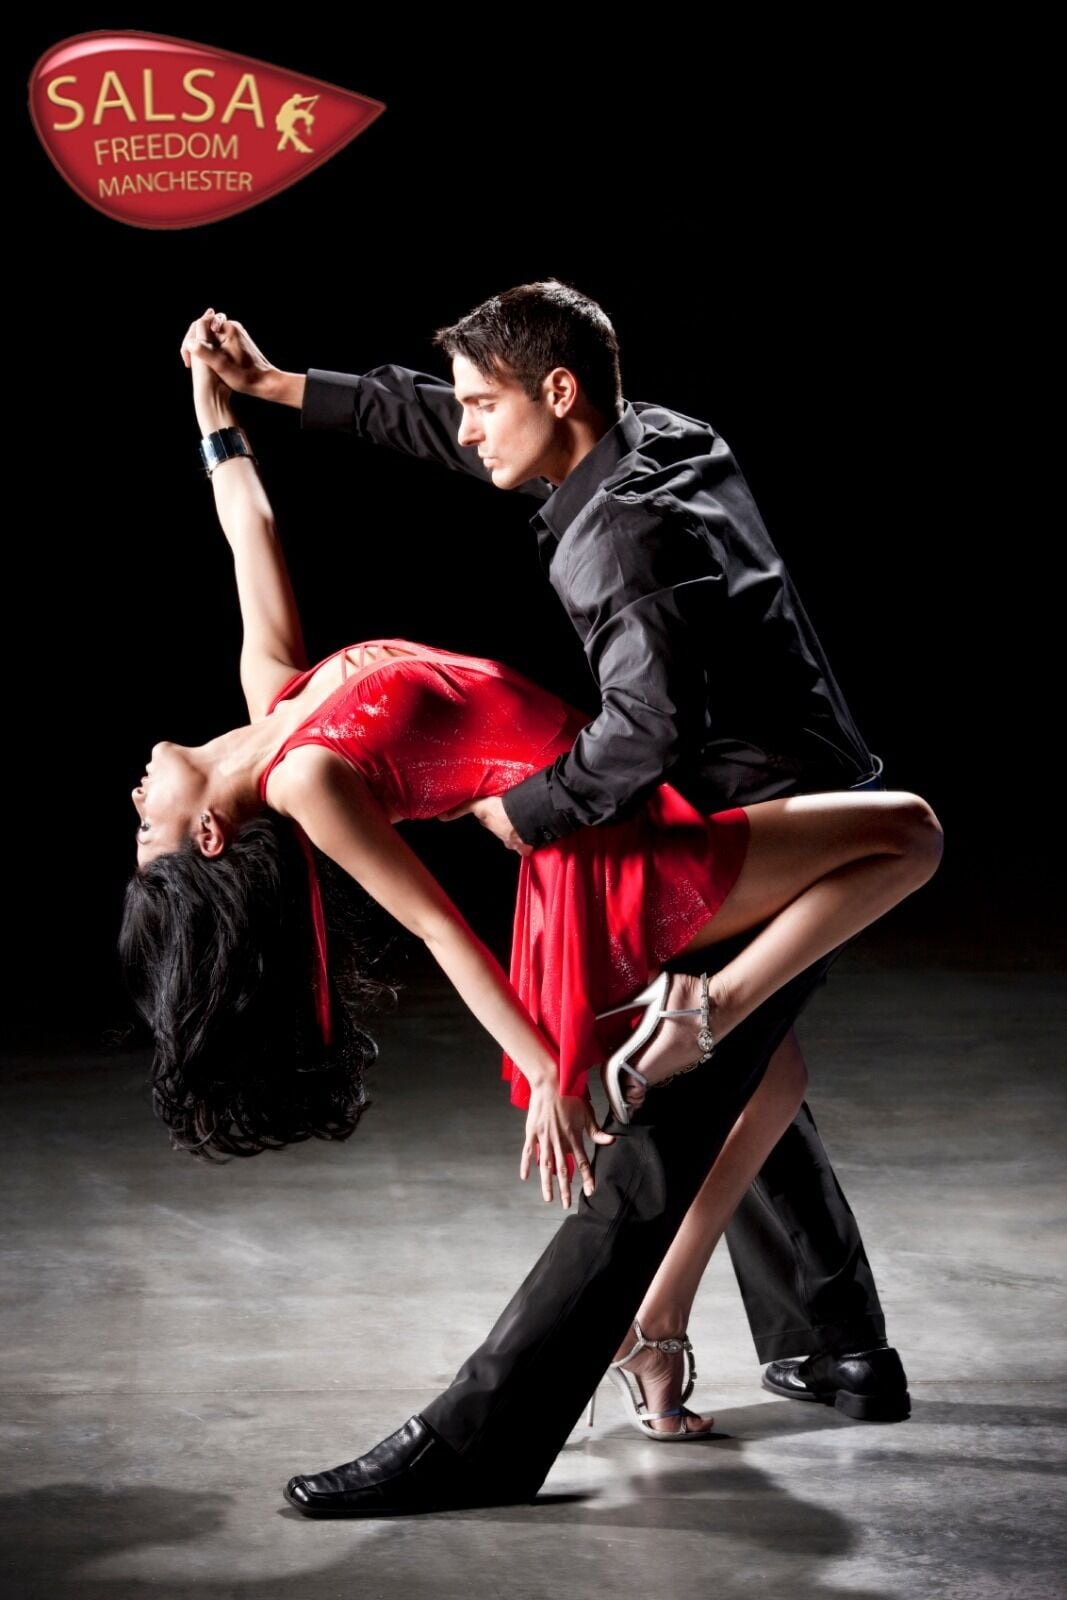 Salsa Freedom Dance Classes